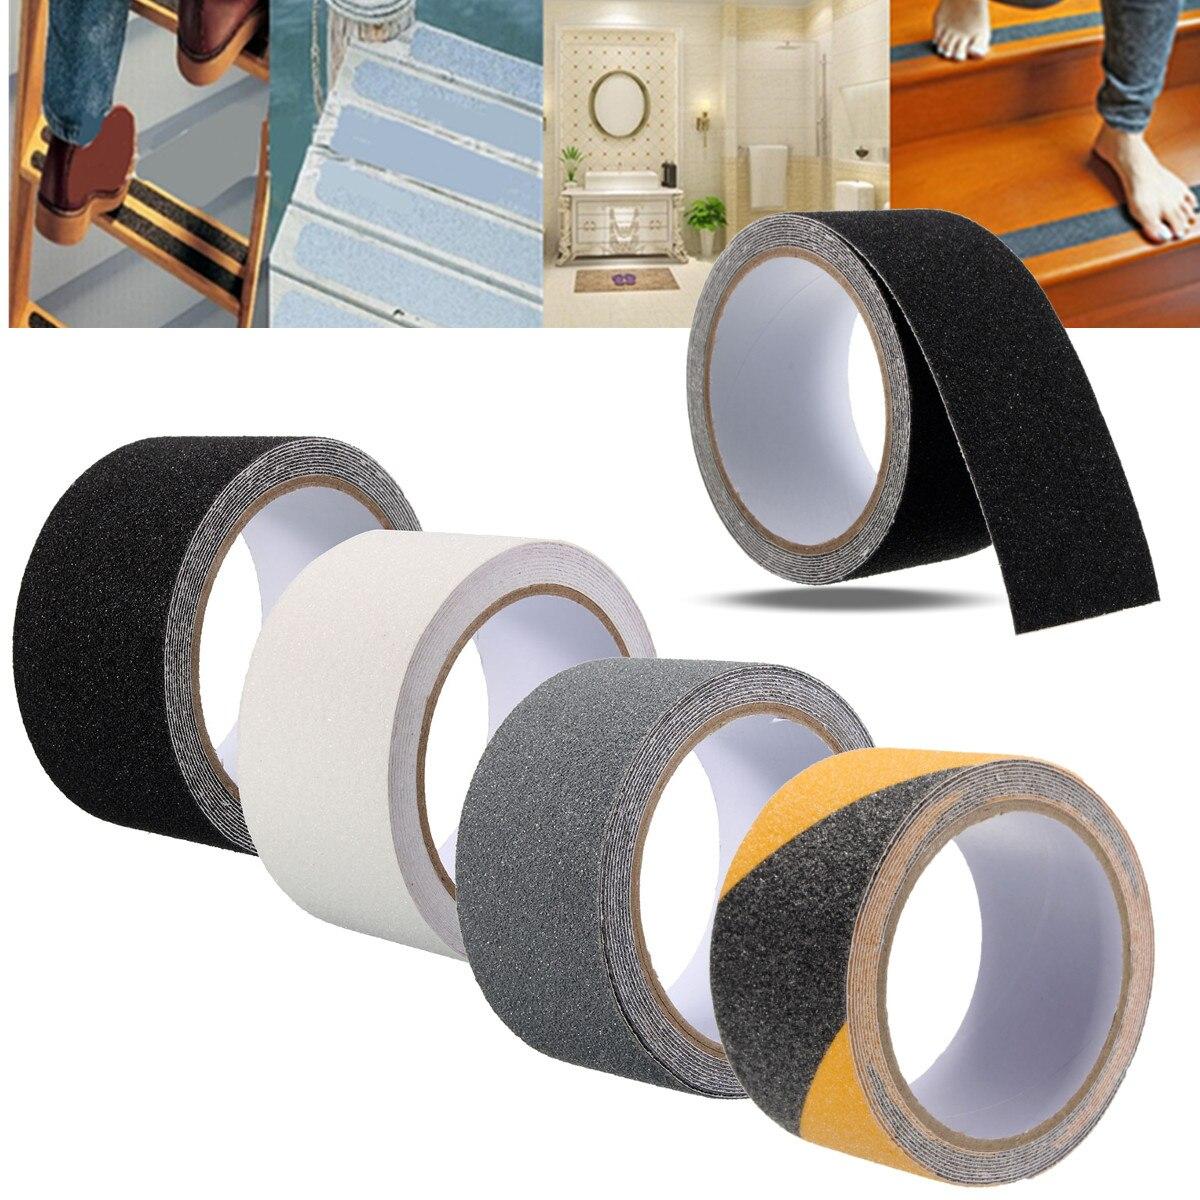 Cosmos Pack of 8 Anti Slip Non Skid Rug Gripper Tape Pads Black Color CM